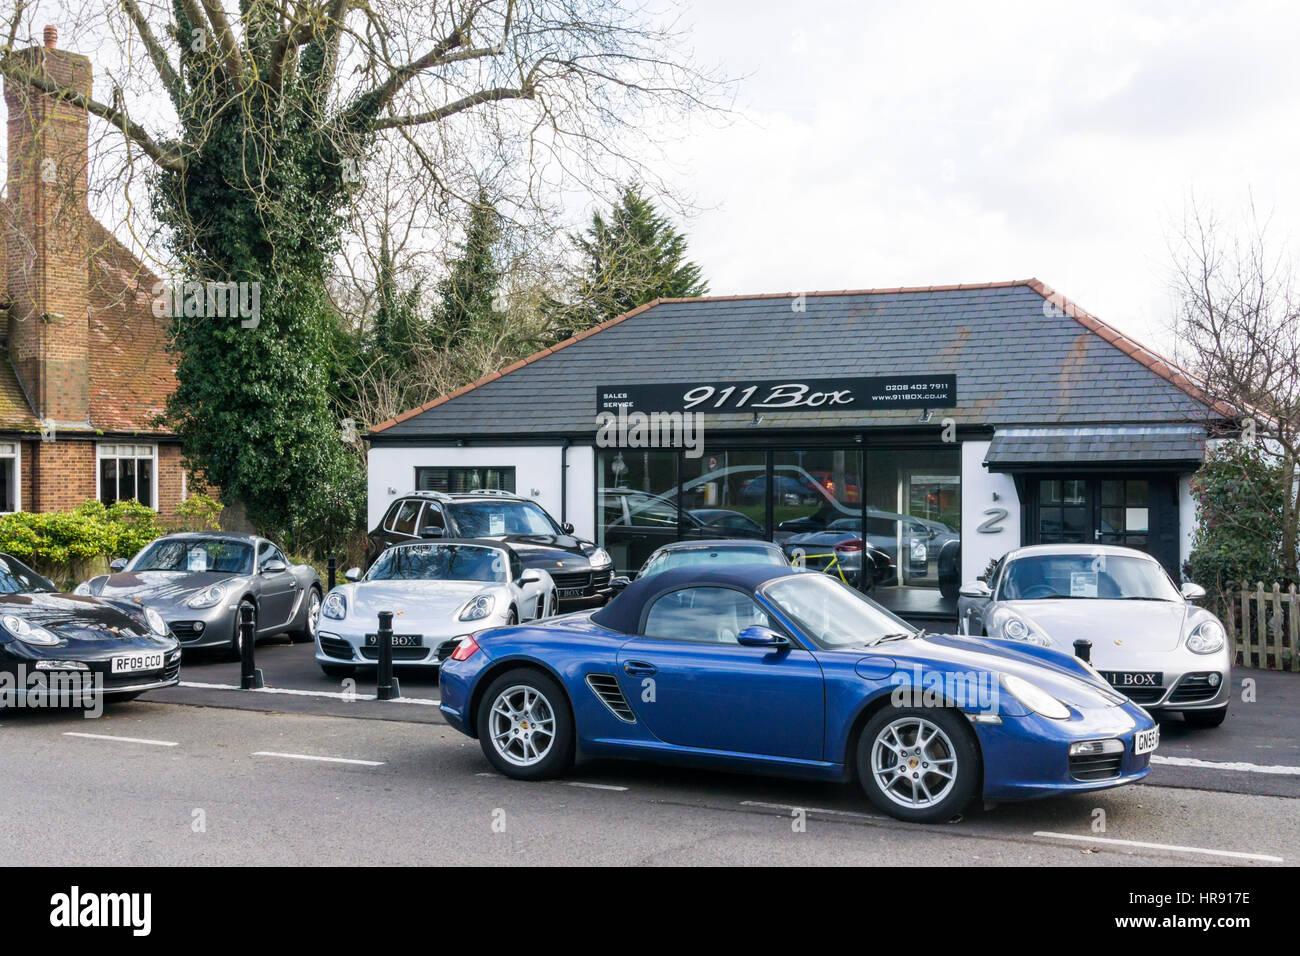 Porsche Dealer Stock Photos & Porsche Dealer Stock Images - Alamy